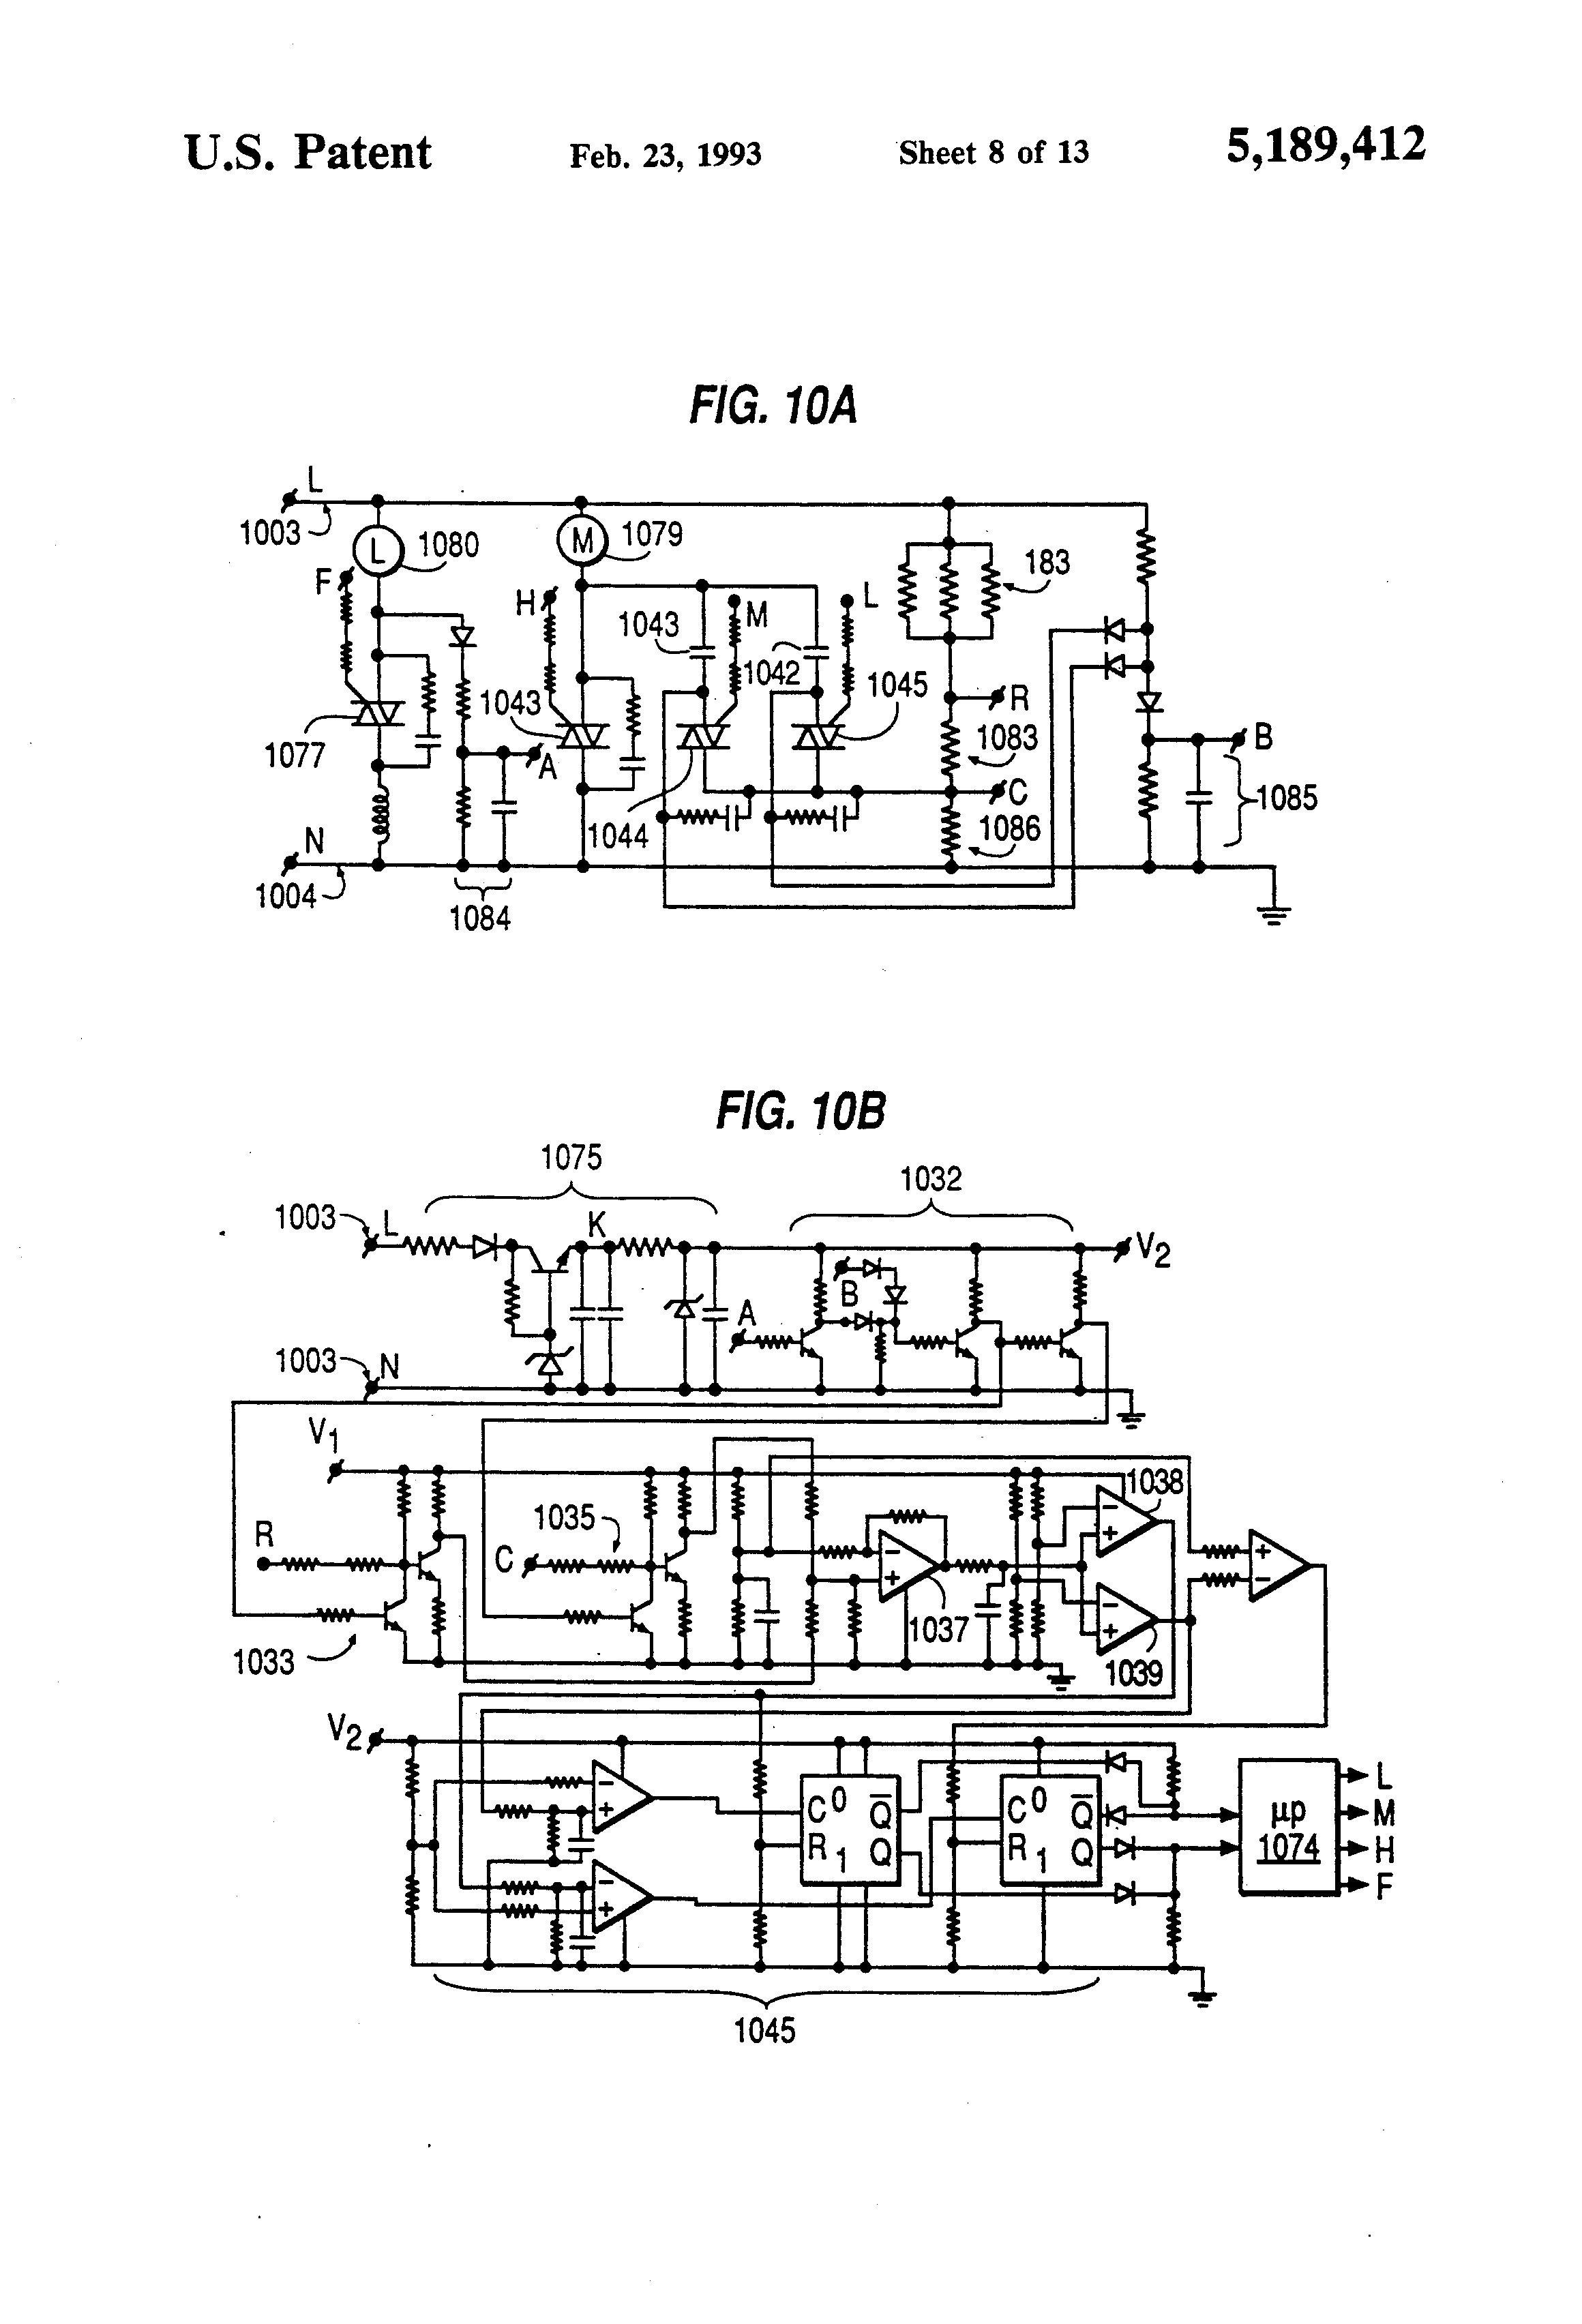 Wiring Diagram For Whole House Fan New Fan Switch Wiring Diagram